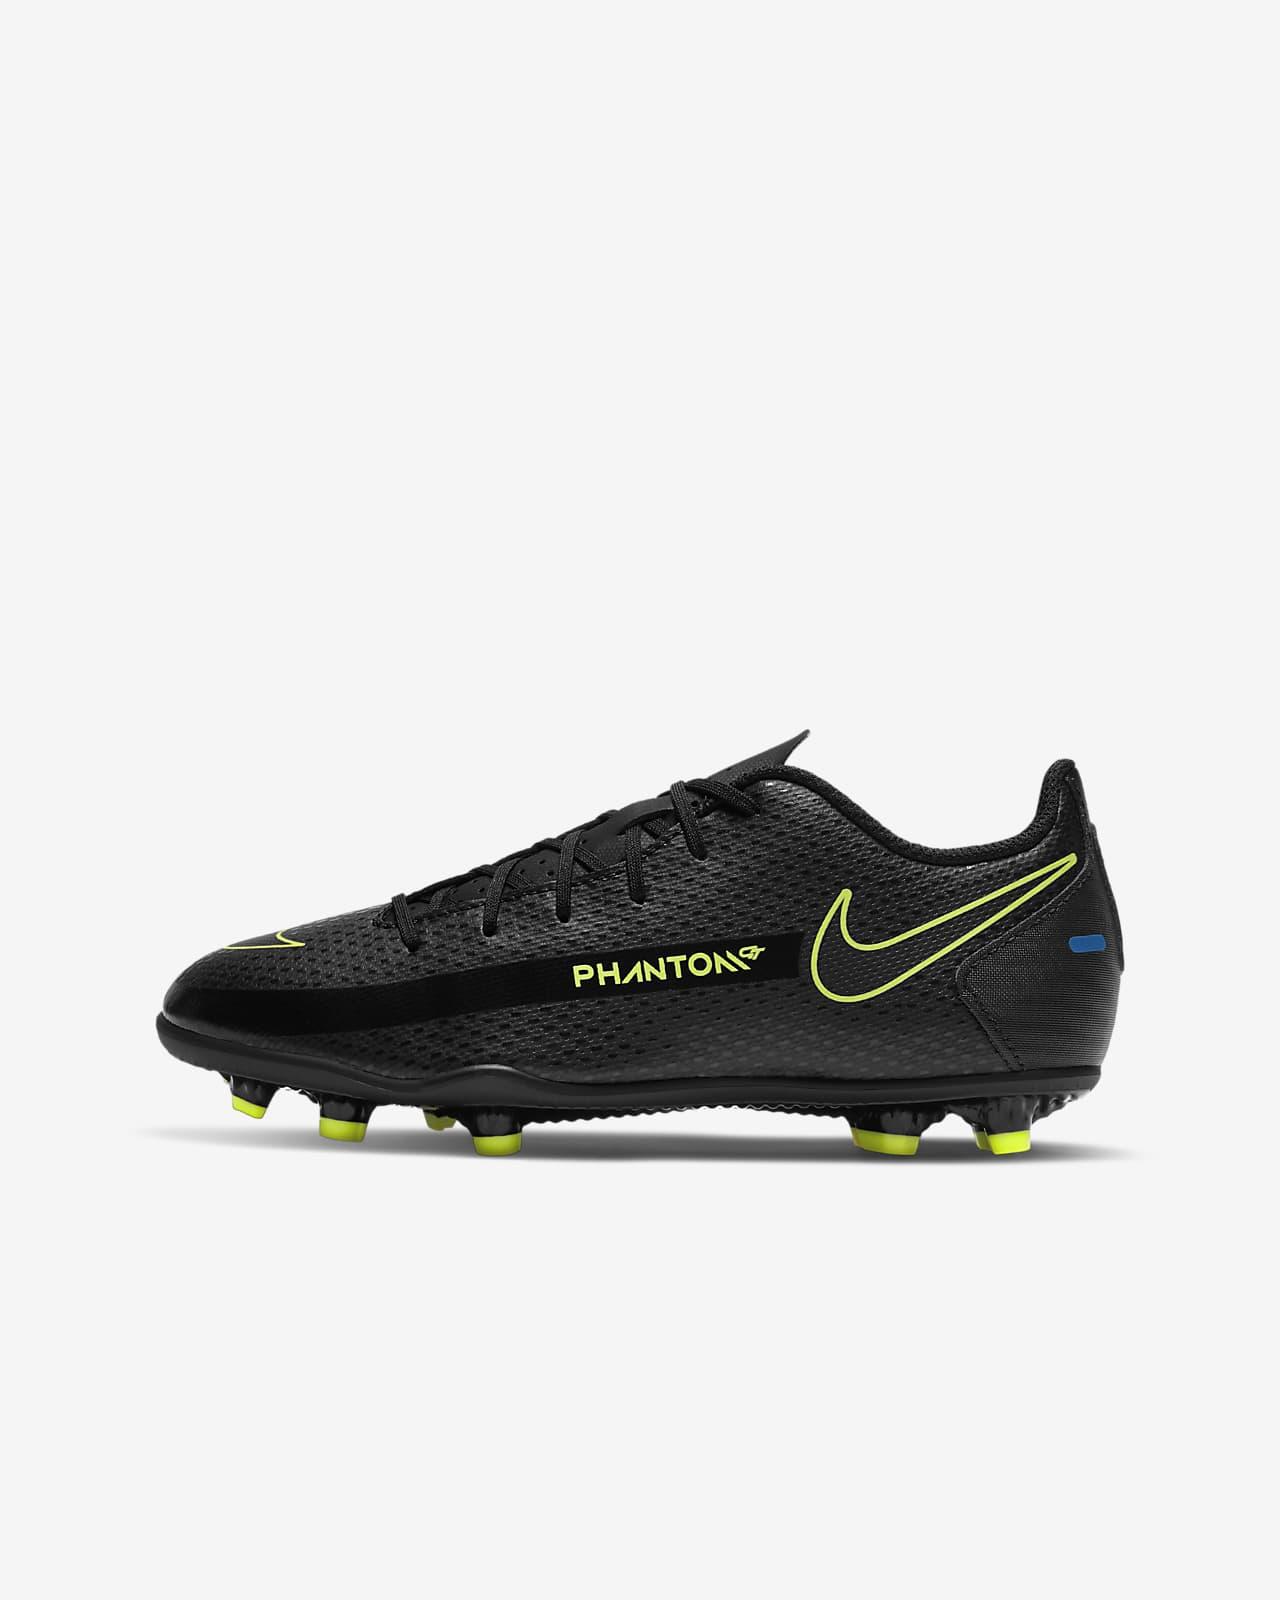 Nike Jr. Phantom GT Club MG Voetbalschoen voor kleuters/kids (meerdere ondergronden)